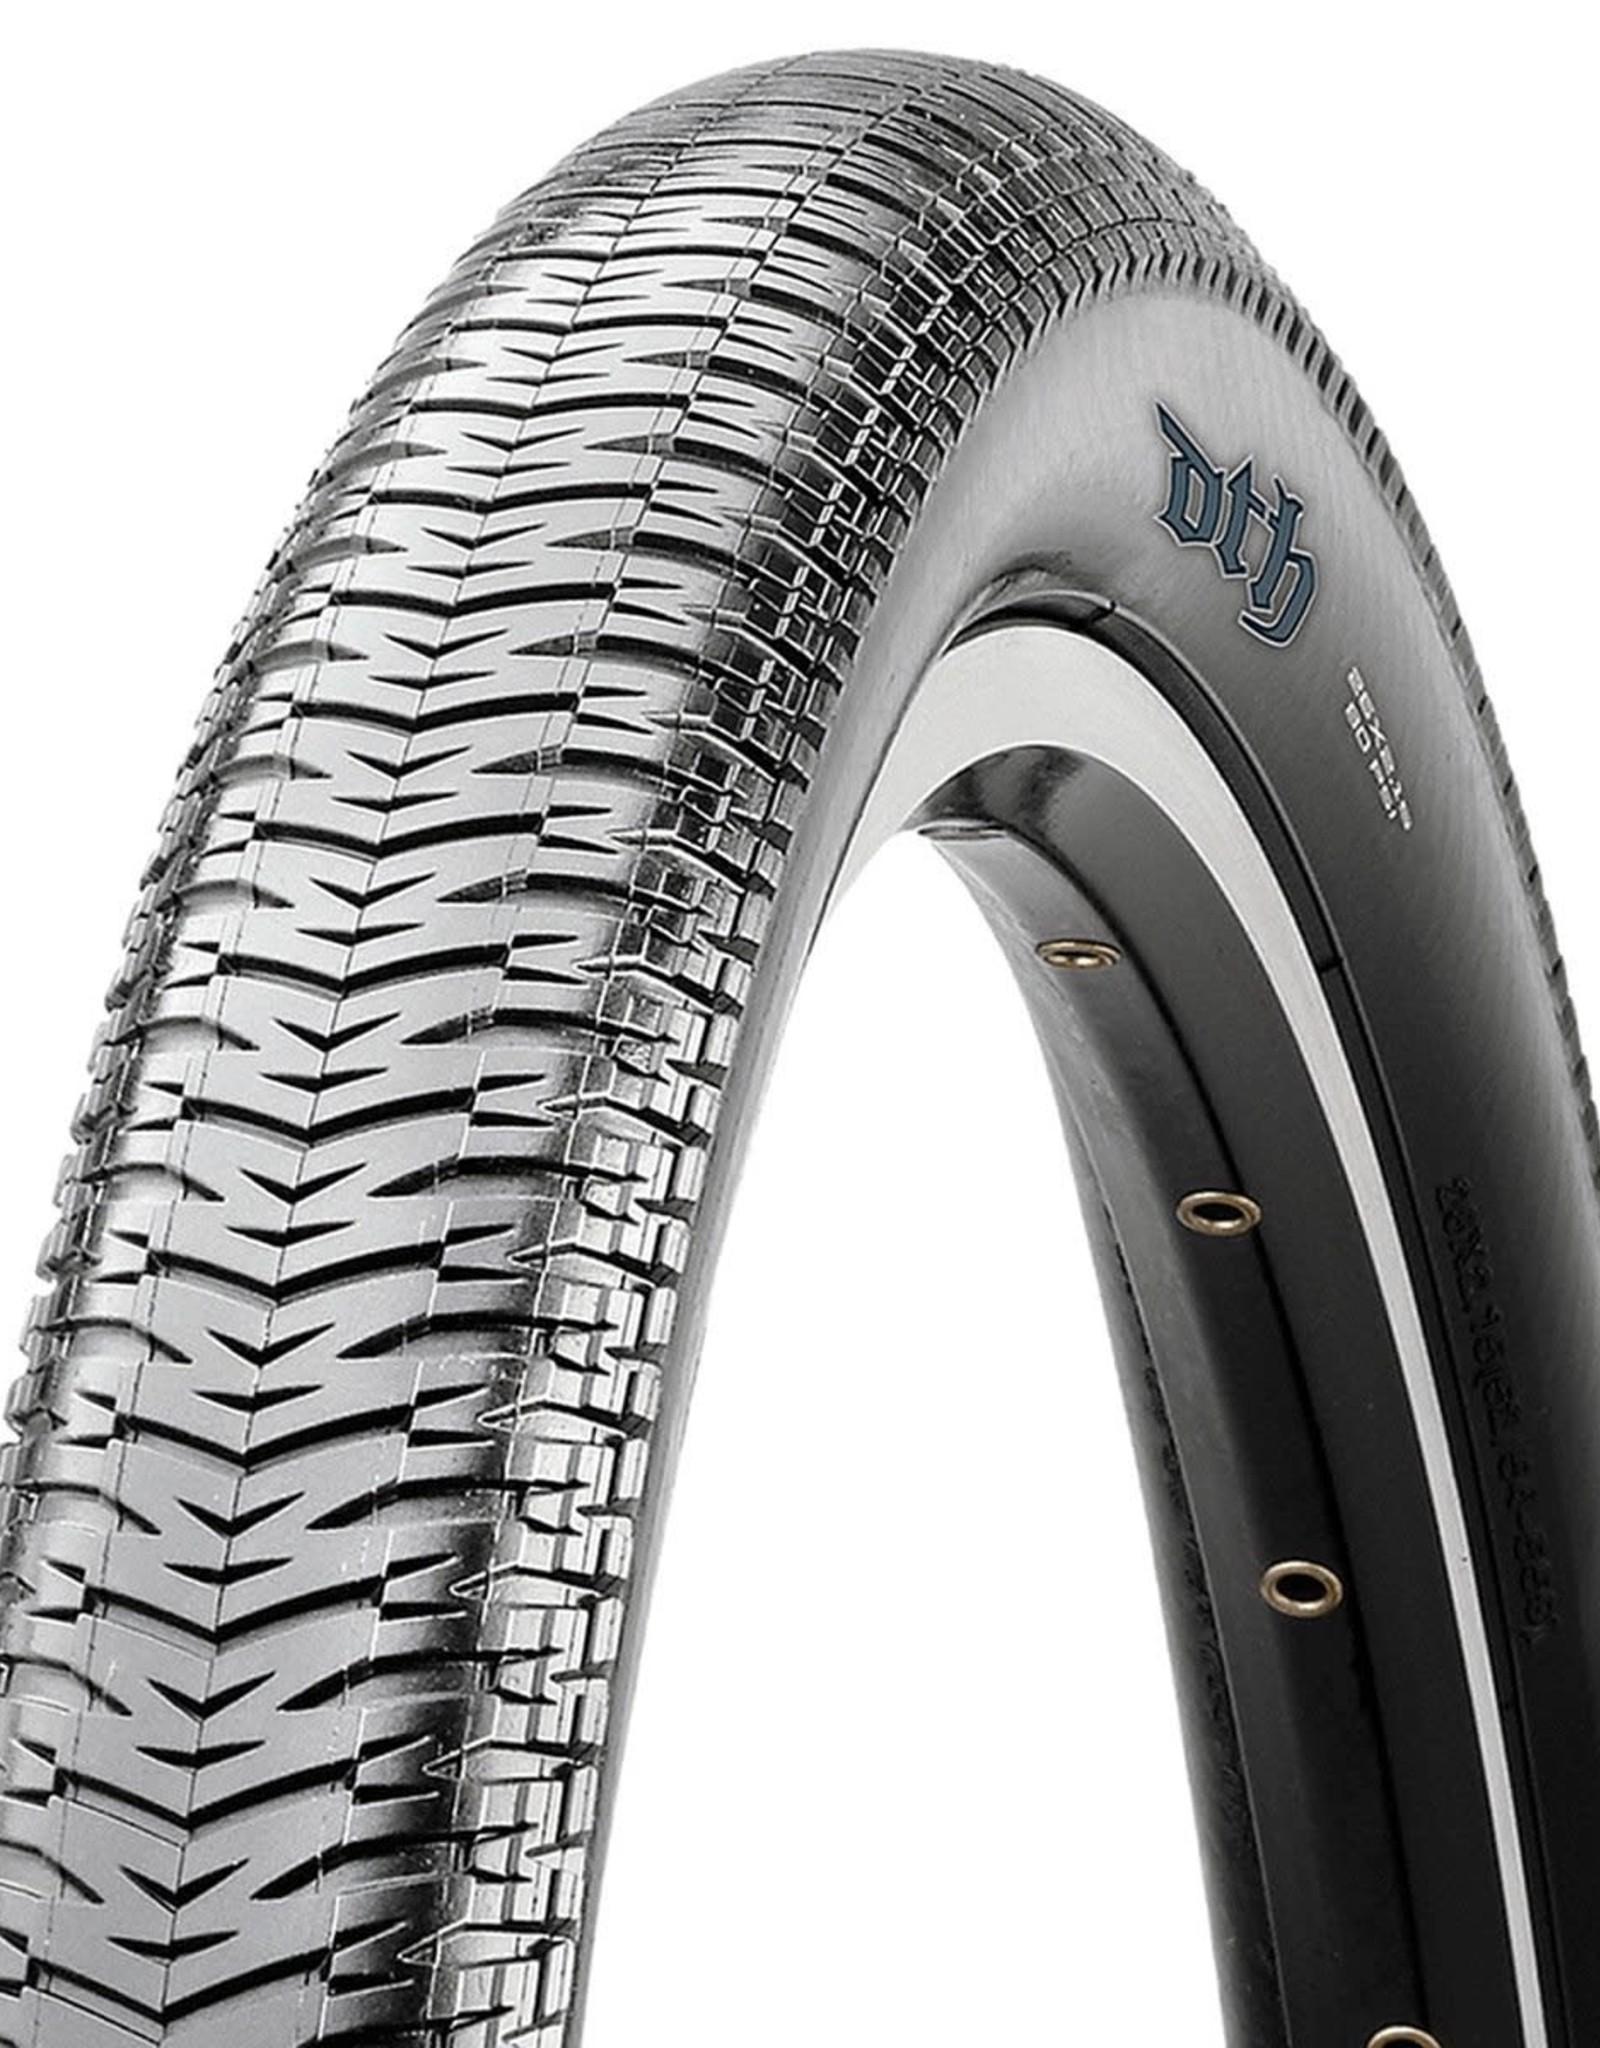 Maxxis Maxxis DTH Tire - 26 x 2.15, Clincher, Folding, Black, Single